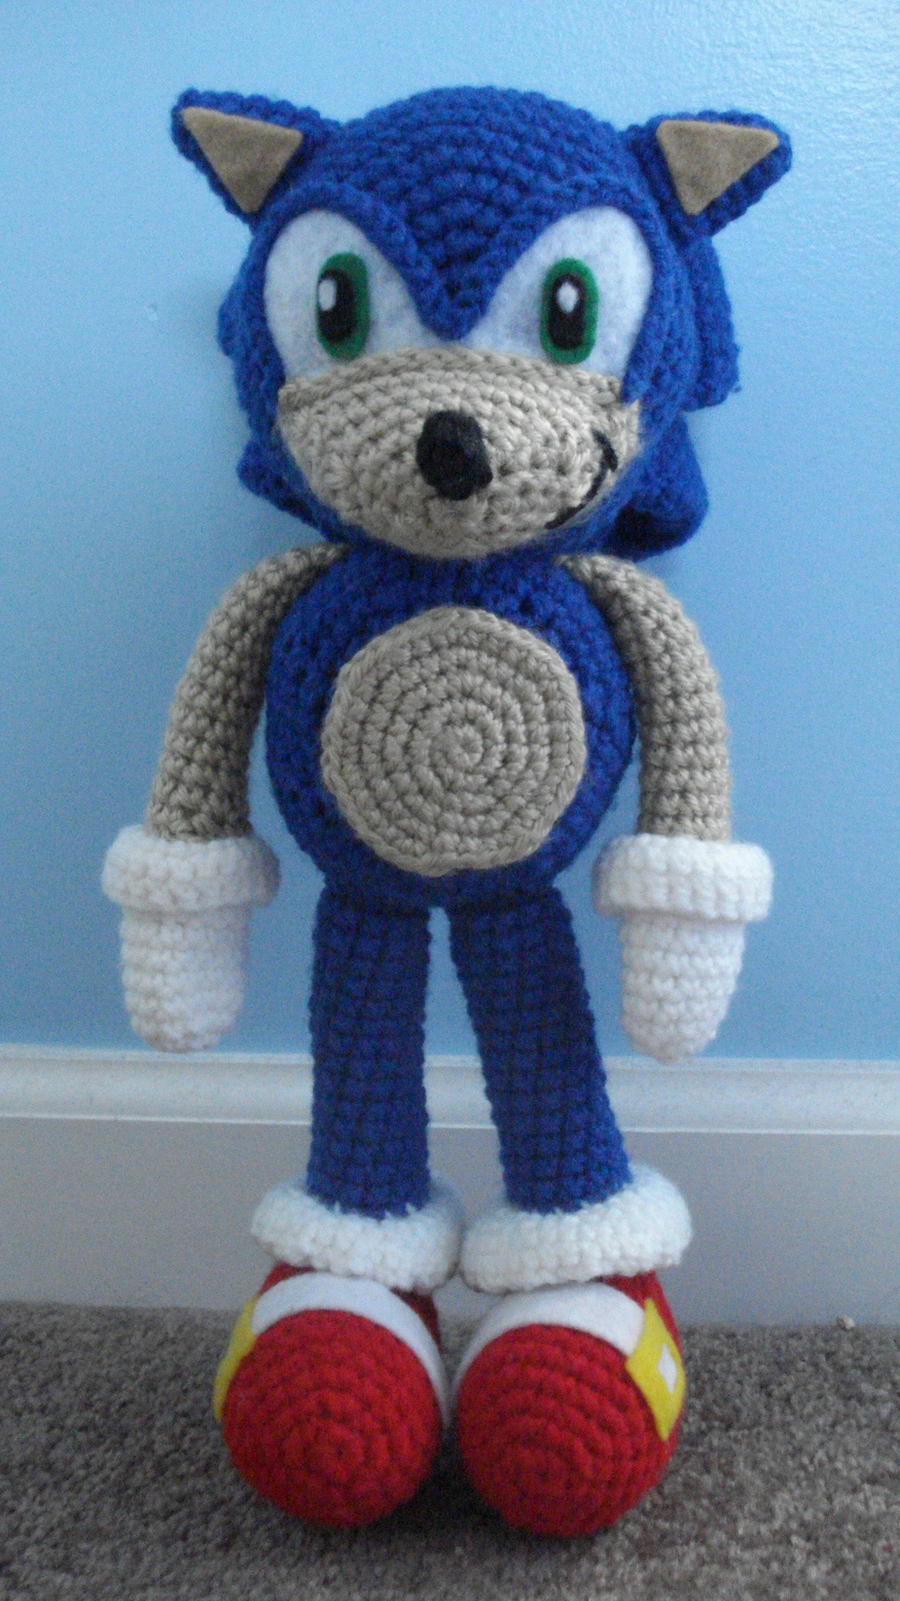 sonic the hedgehog amigurumi by TheArtisansNook on DeviantArt